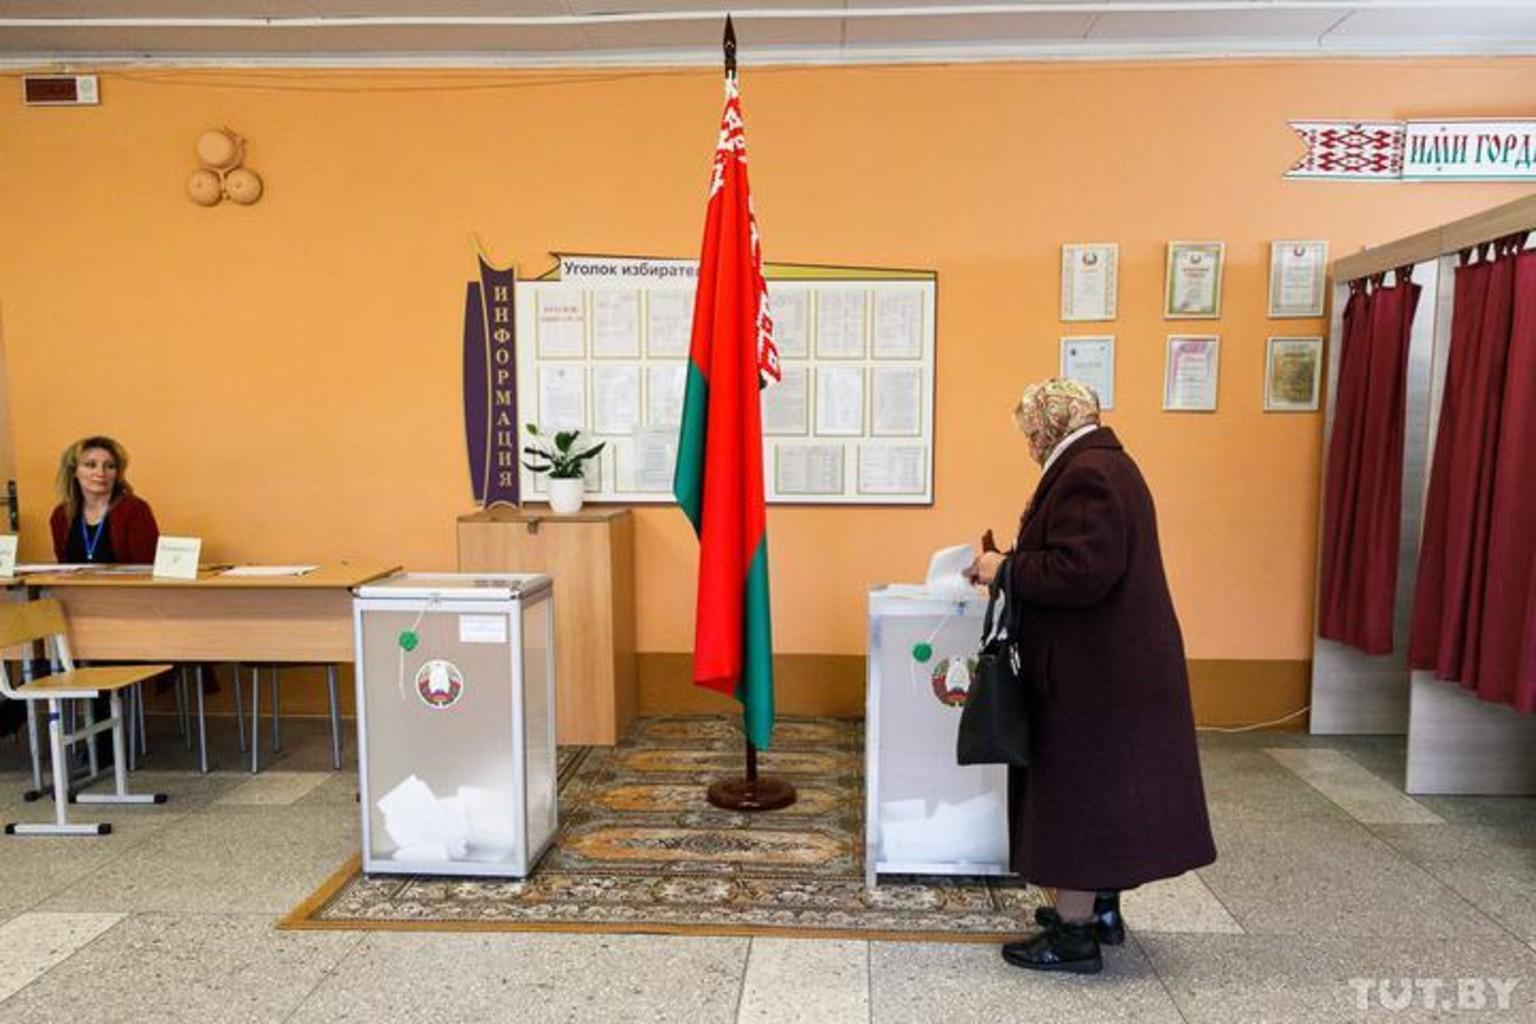 Vybory 20191117 shuk tutby phsl 5433